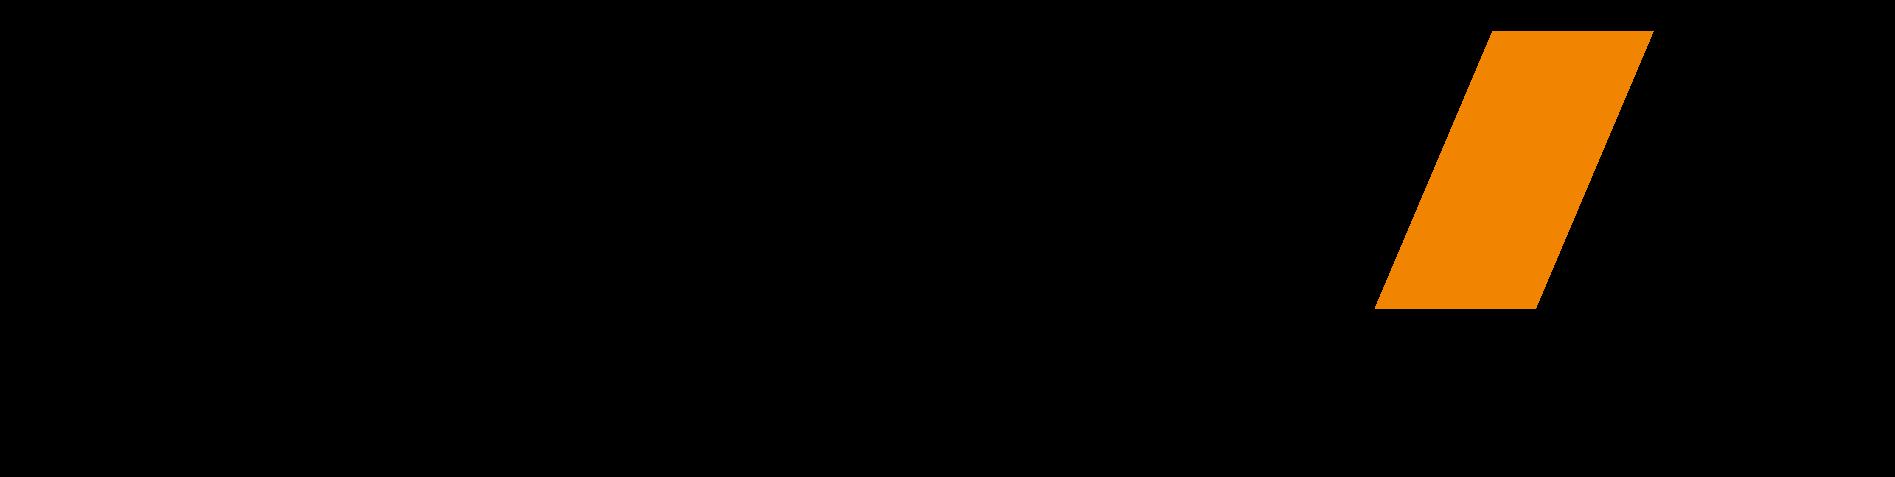 Spitze Rimle GmbH